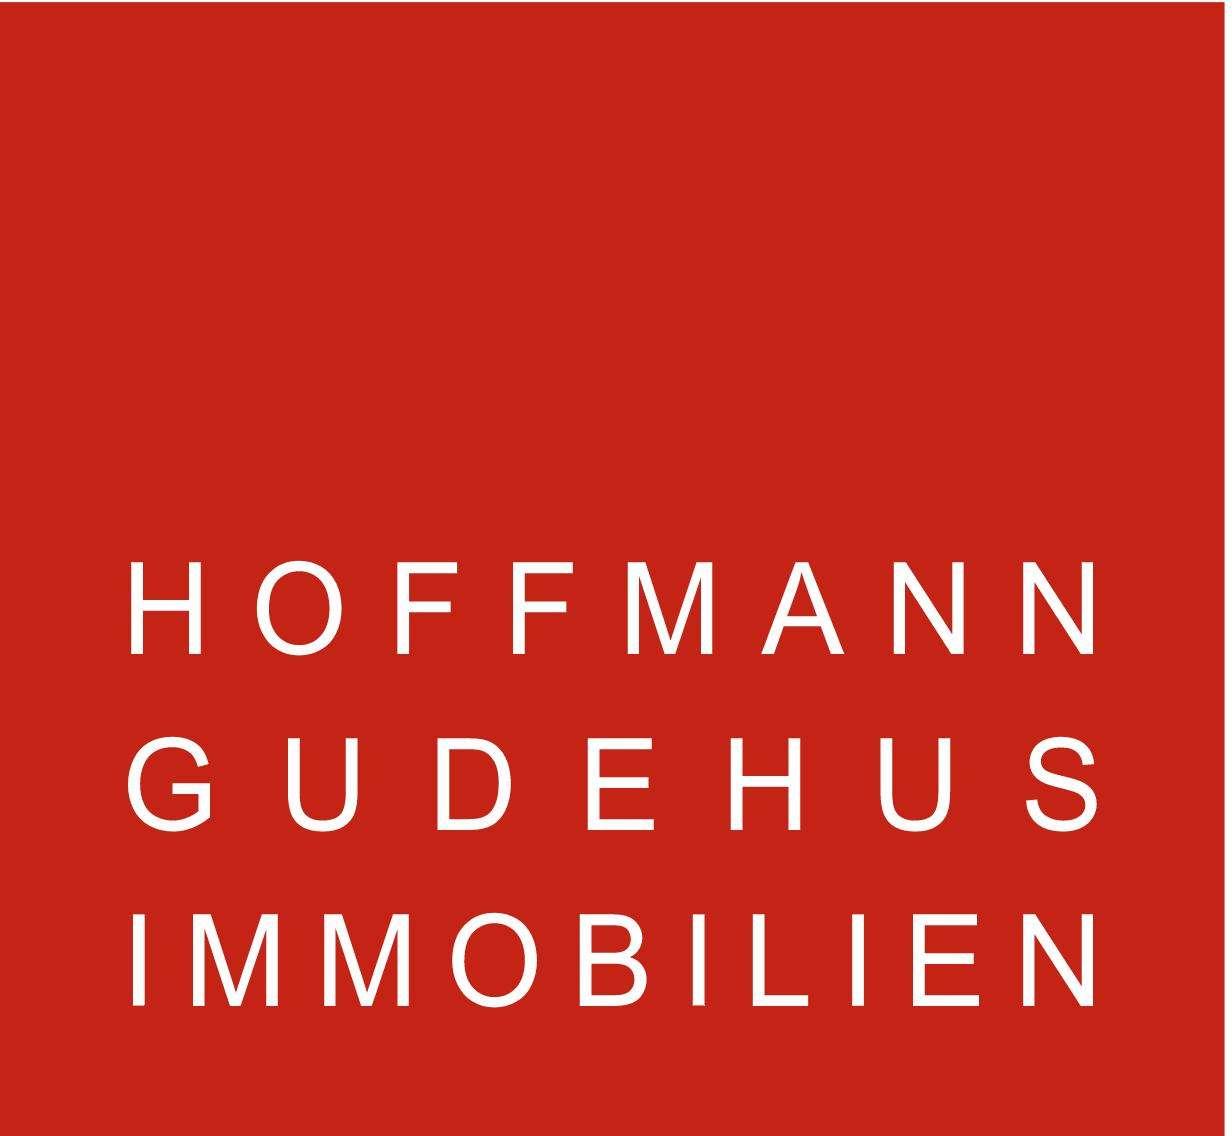 Makler HOFFMANN GUDEHUS IMMOBILIEN logo